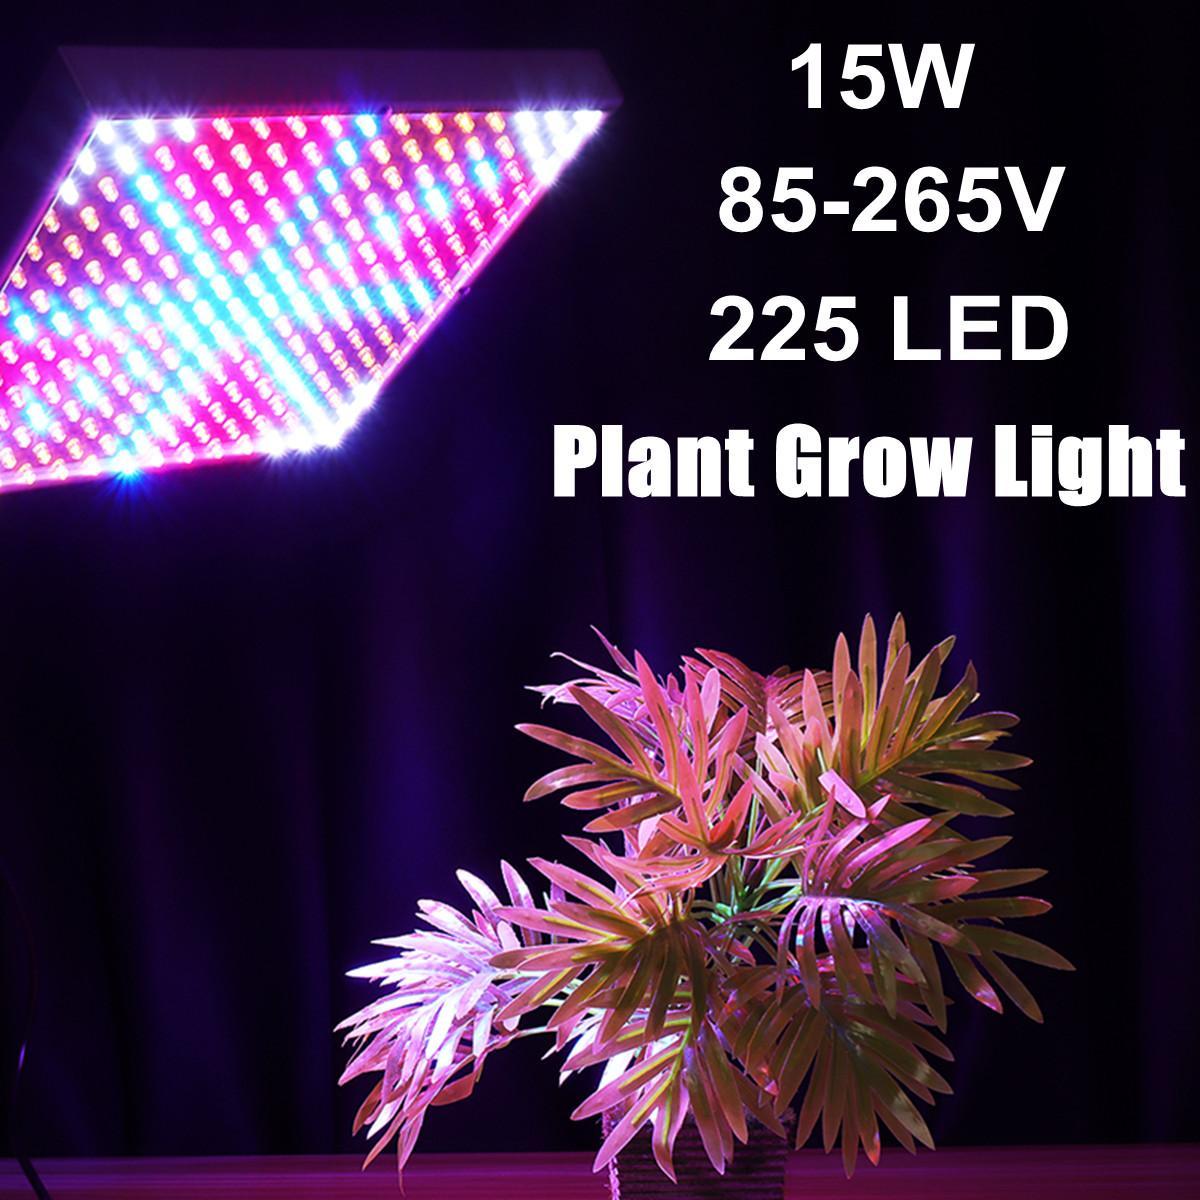 Kit de plántulas de clonación de propagación de paneles LED, esterilla de calor, carpa de cultivo, configuración hidropónica 85-265V